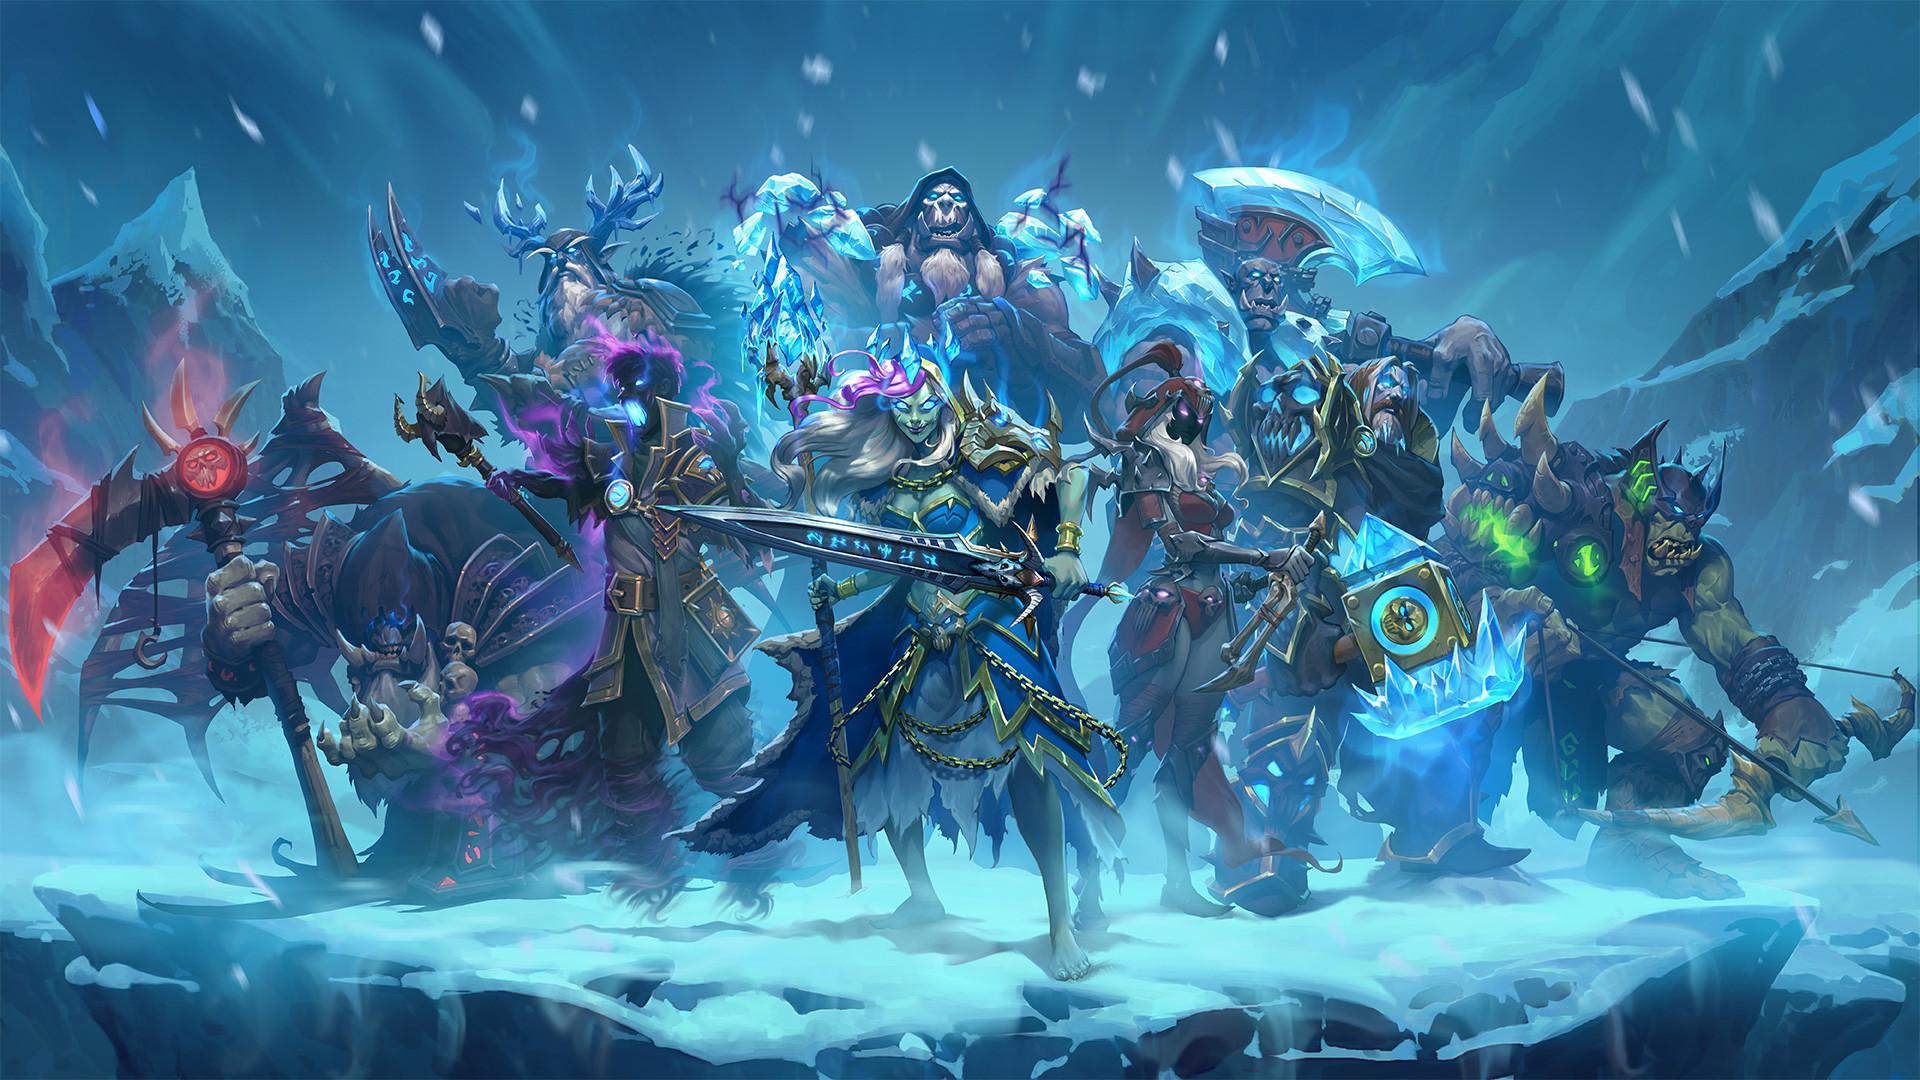 … Wallpaper Death Knight Heroes